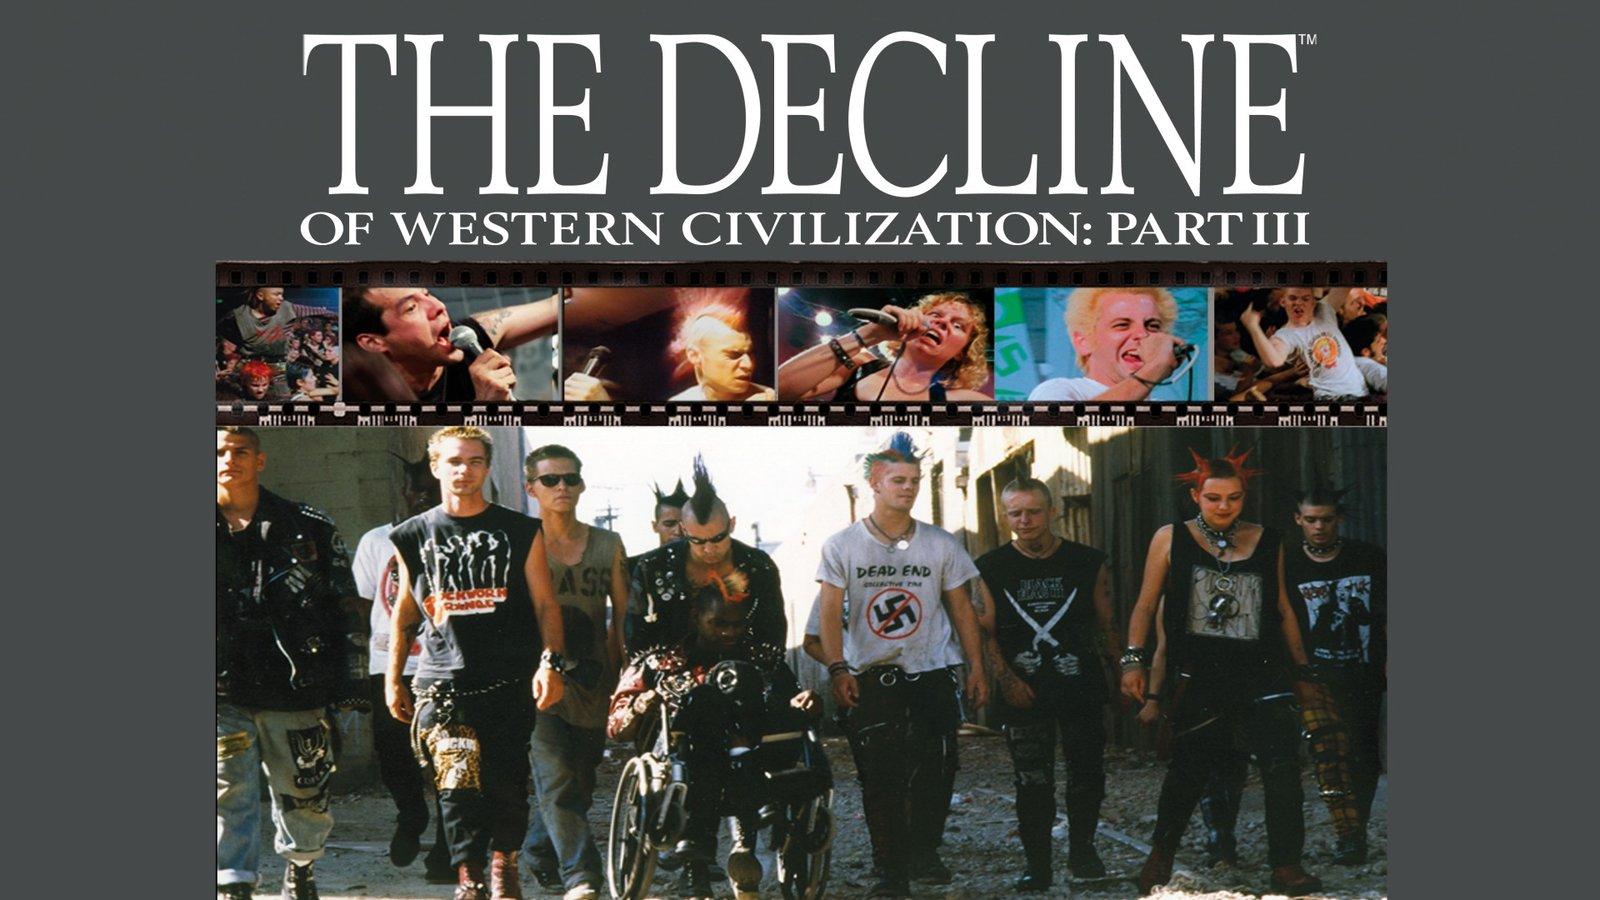 The Decline of Western Civilization 3